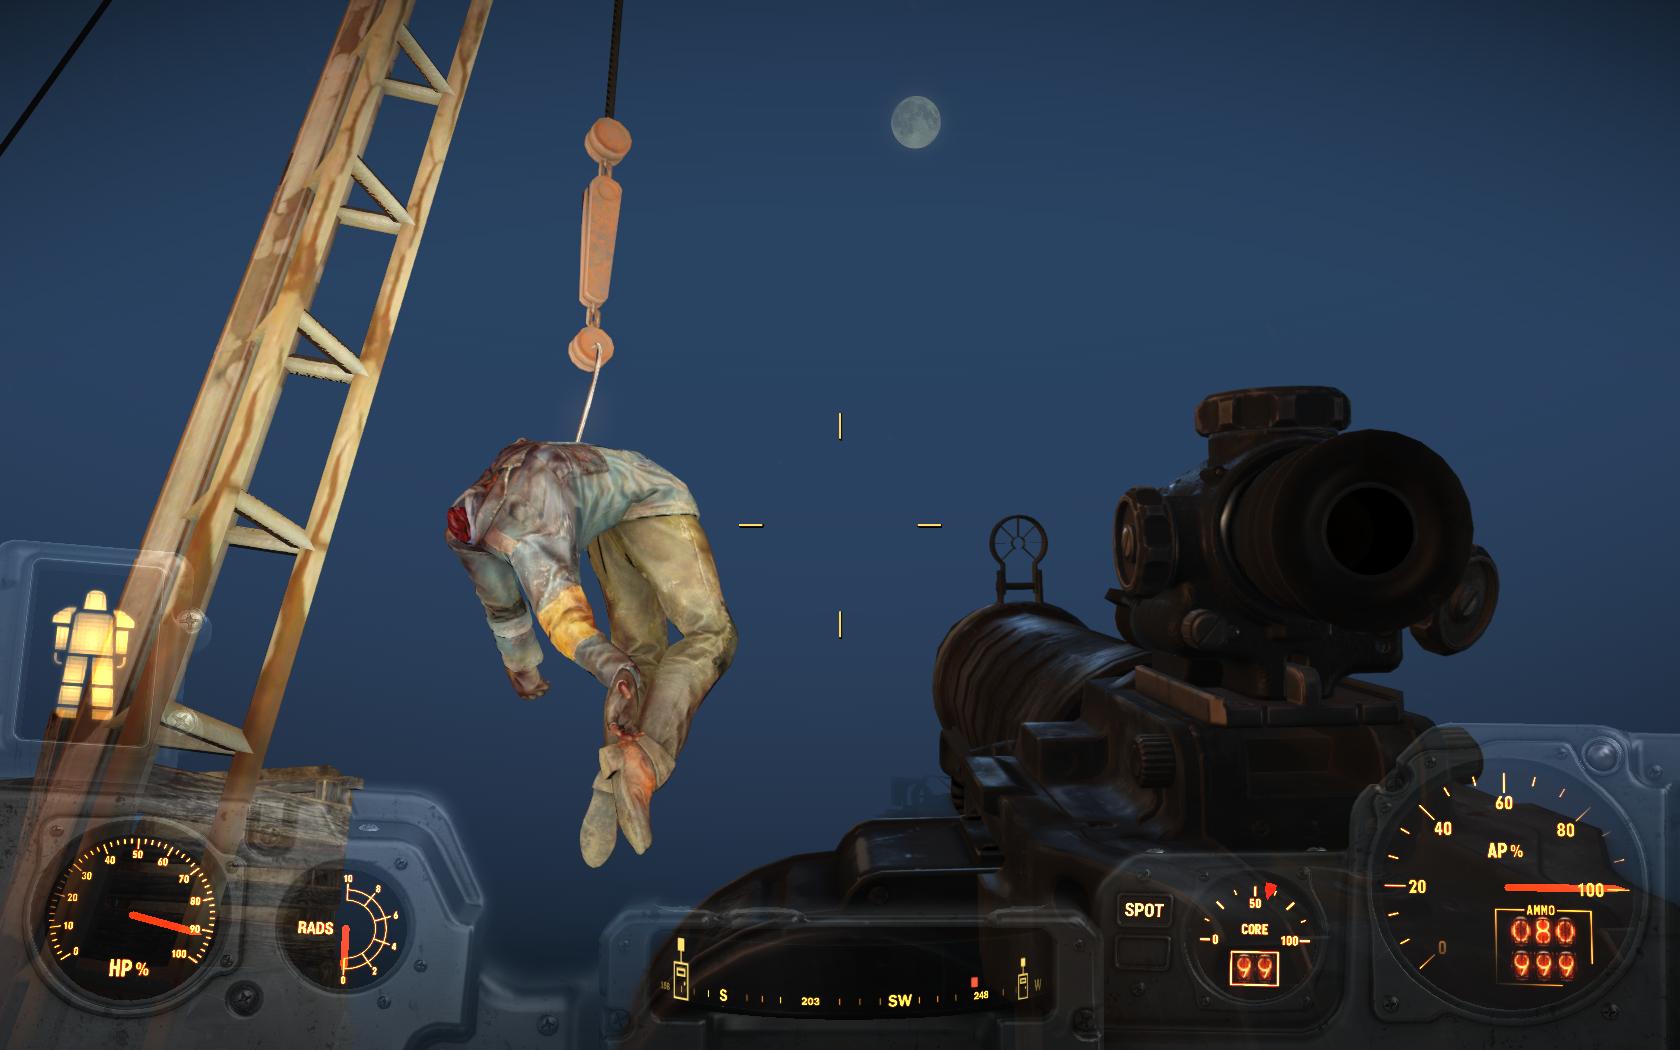 Варвары (Либерталия) - Fallout 4 Варвары, Либерталия